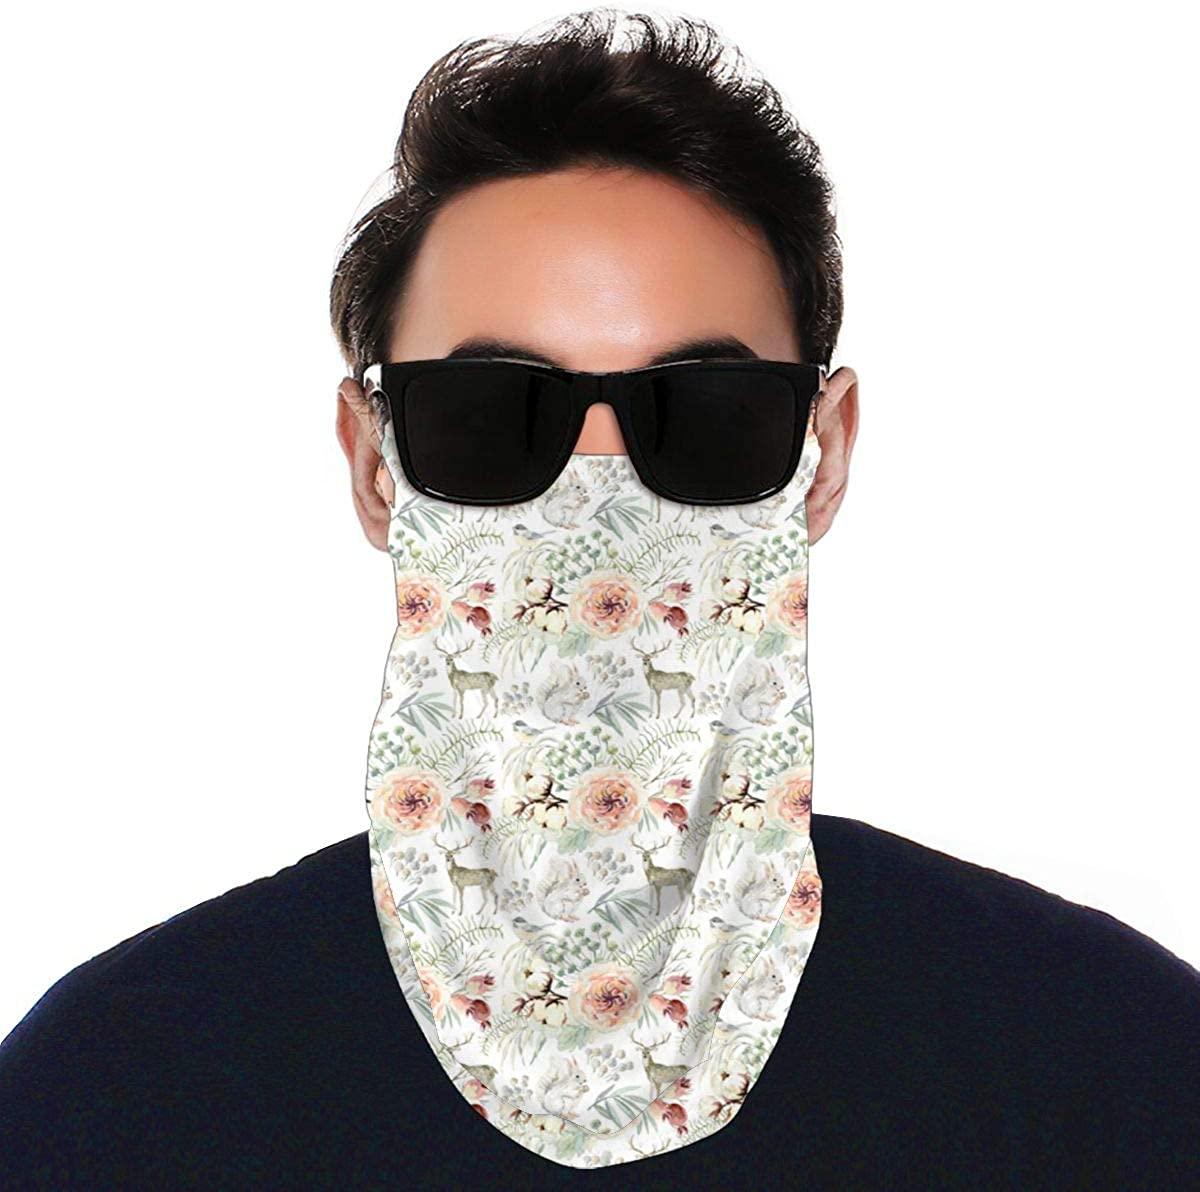 Pearl Winter WhiteEar Loops Bandana Face Protector Variety Face Towel Headwear